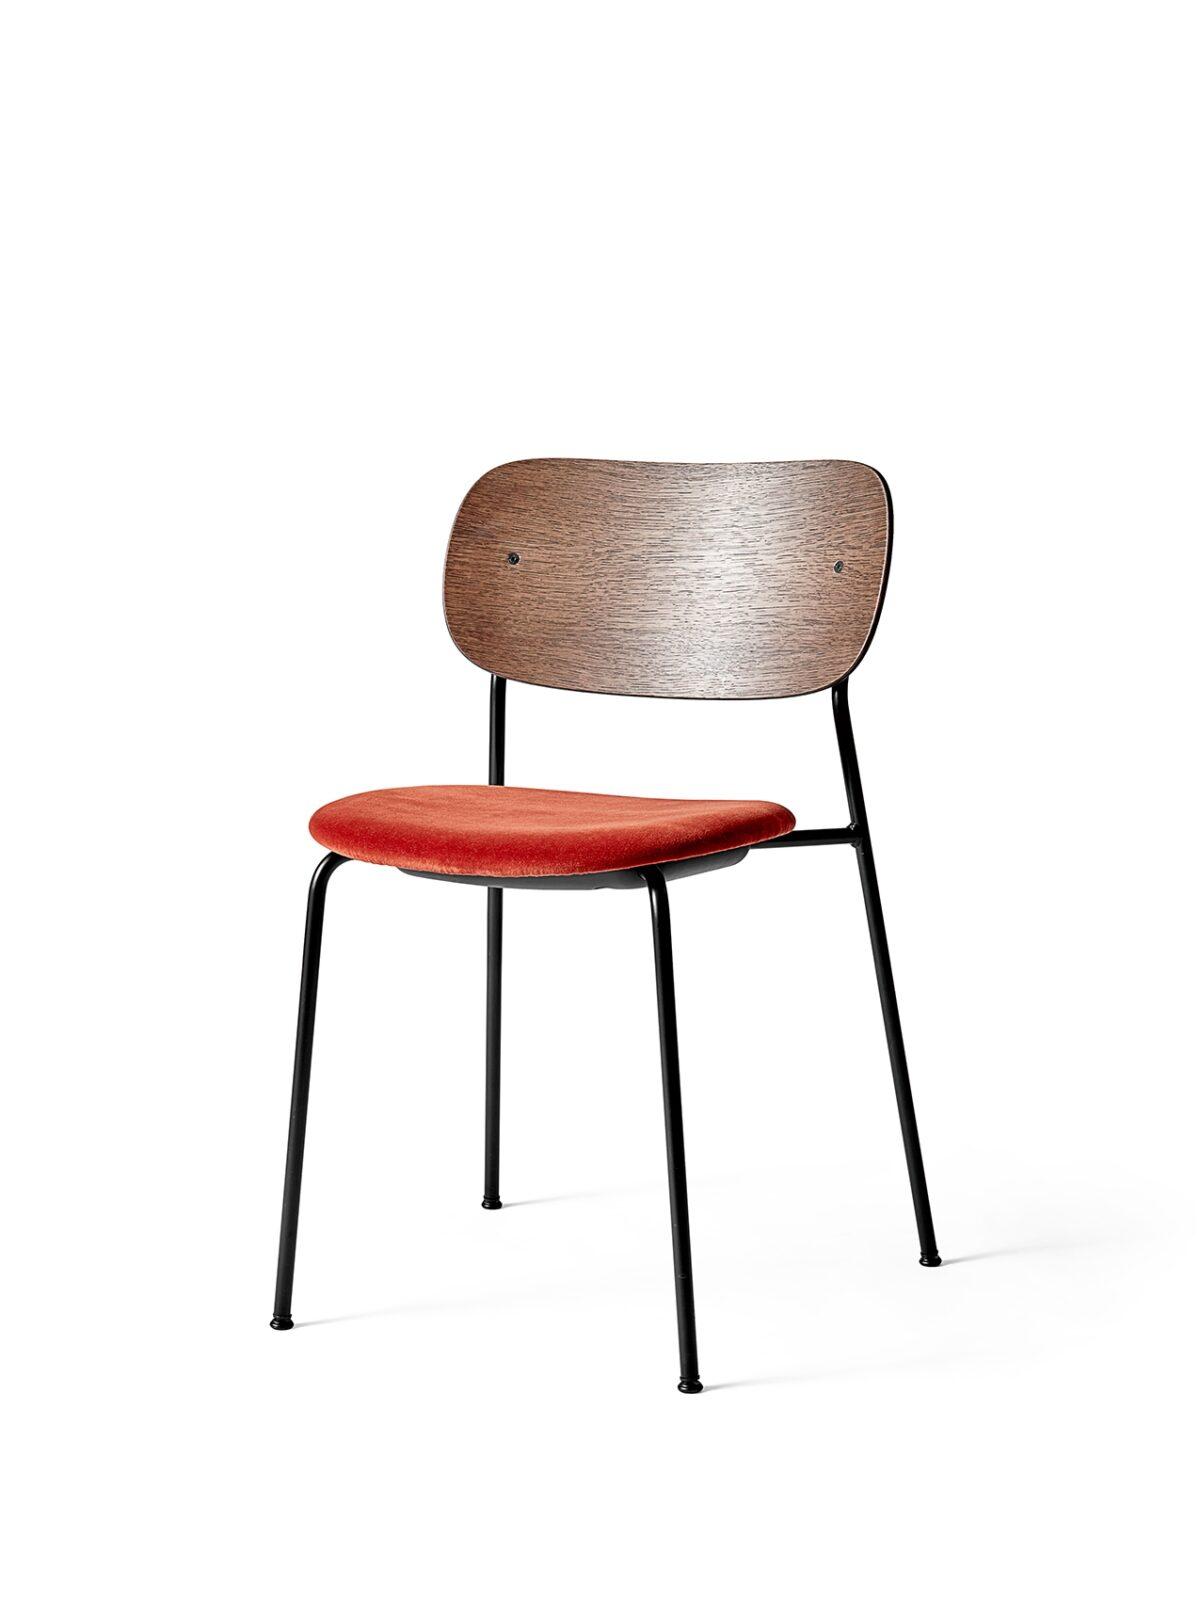 1166849 Co Dining Chair Dark Stained Oak City Velvet CA7832 062 angle